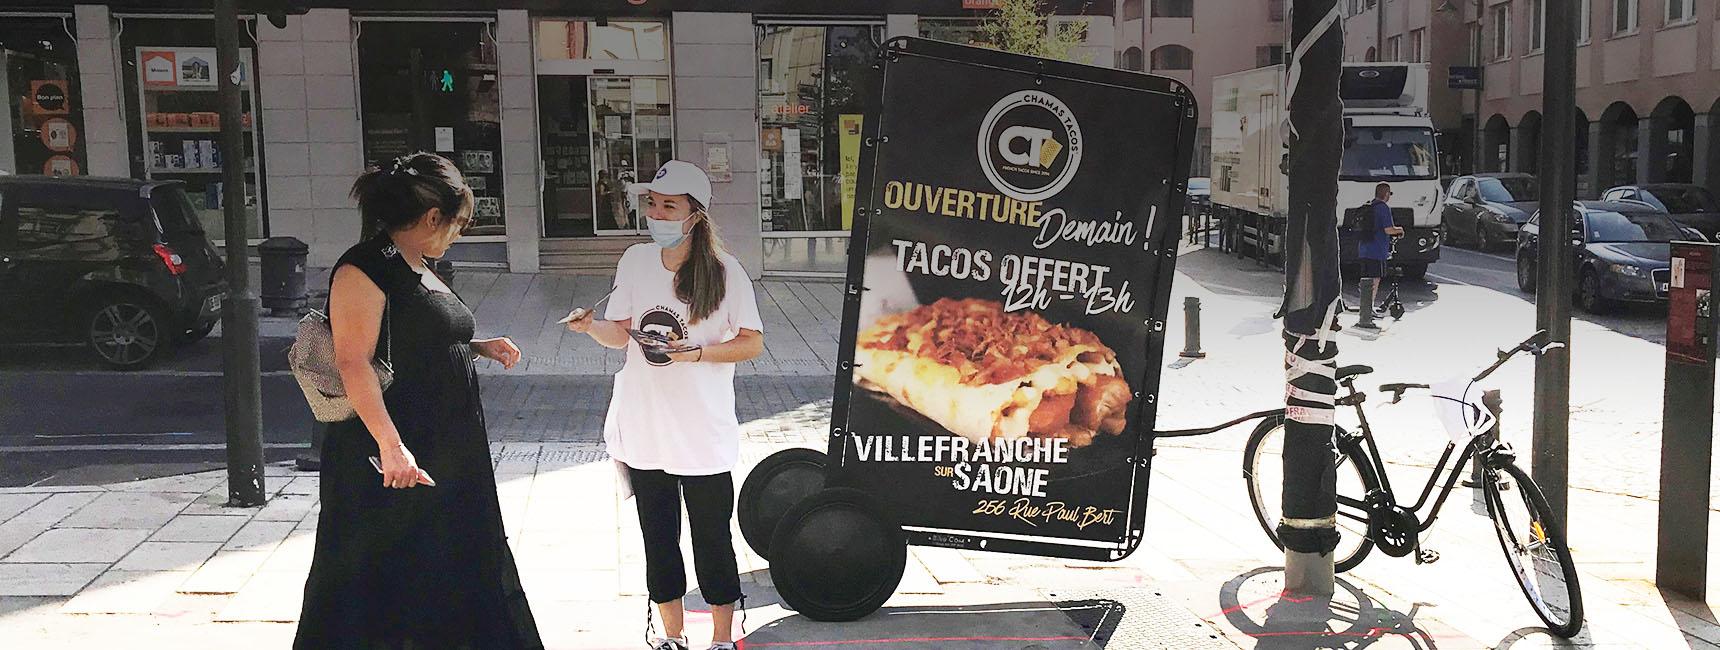 affichage mobile bike'com - keemia lyon agence marketing locale en région Rhône alpes